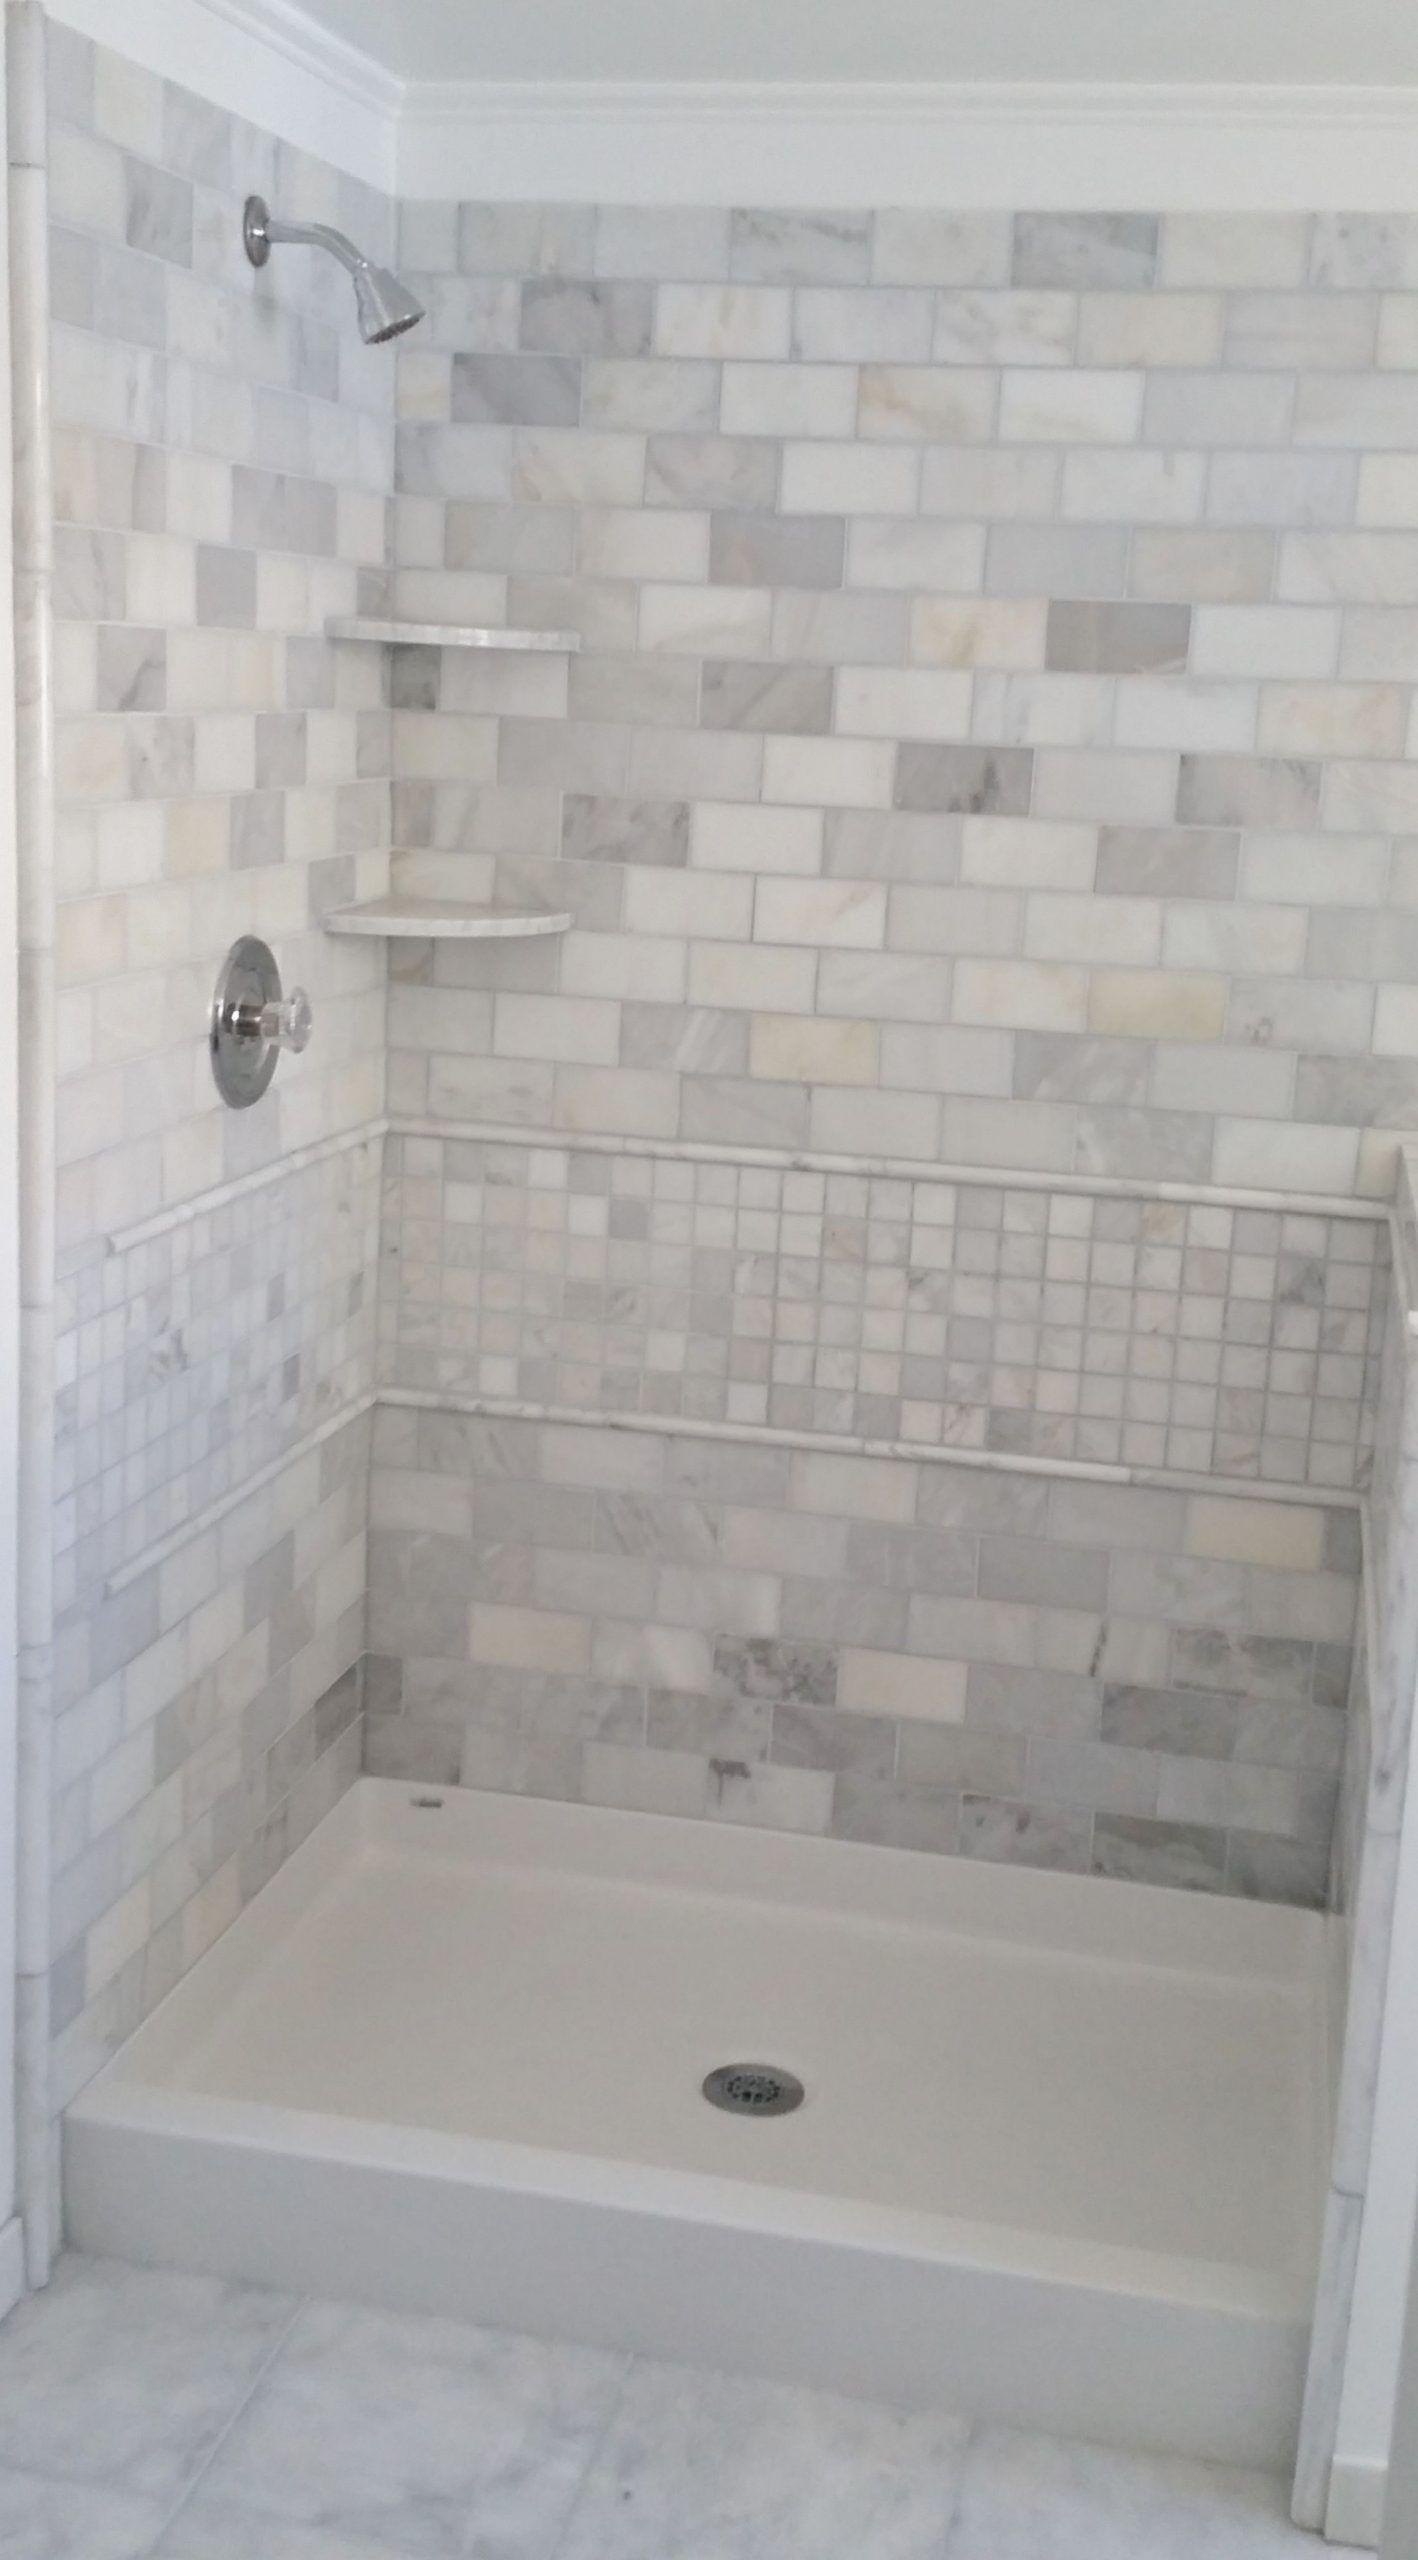 Best Tile For Bathroom Shower Wall Bathroom Shower Tile Wall In 2020